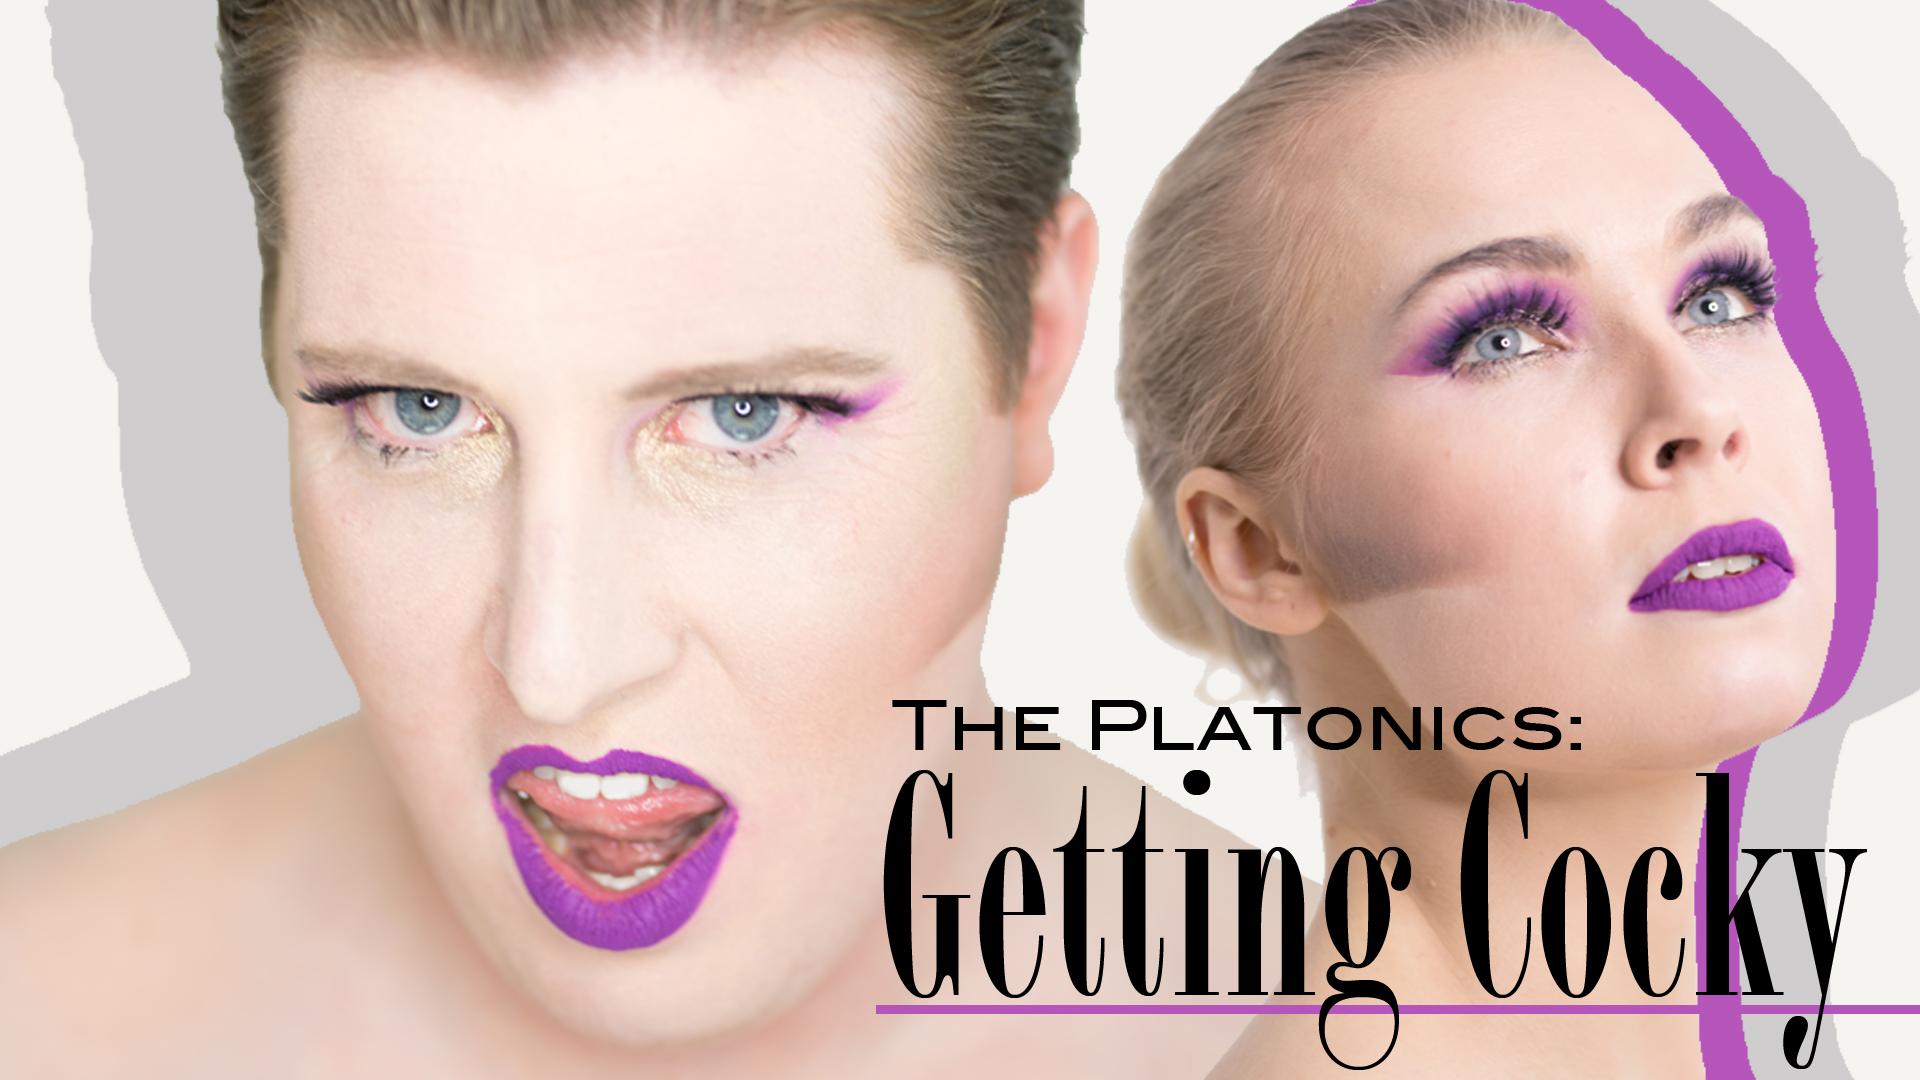 The Platonics: Getting Cocky